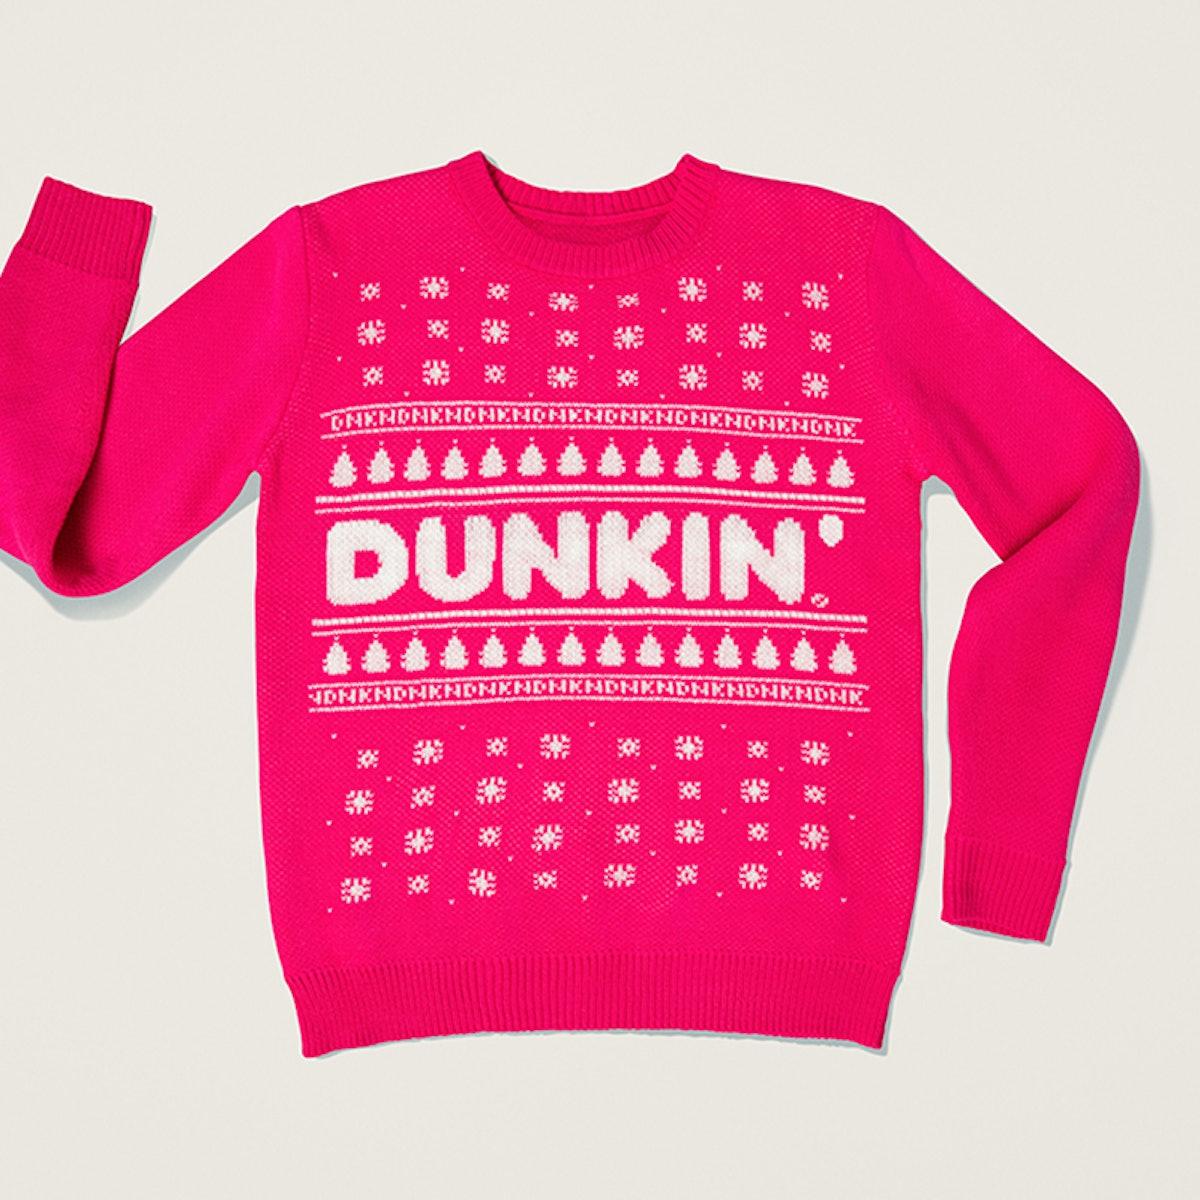 Dunkin' Ugly Sweaterin' Holiday Crewneck